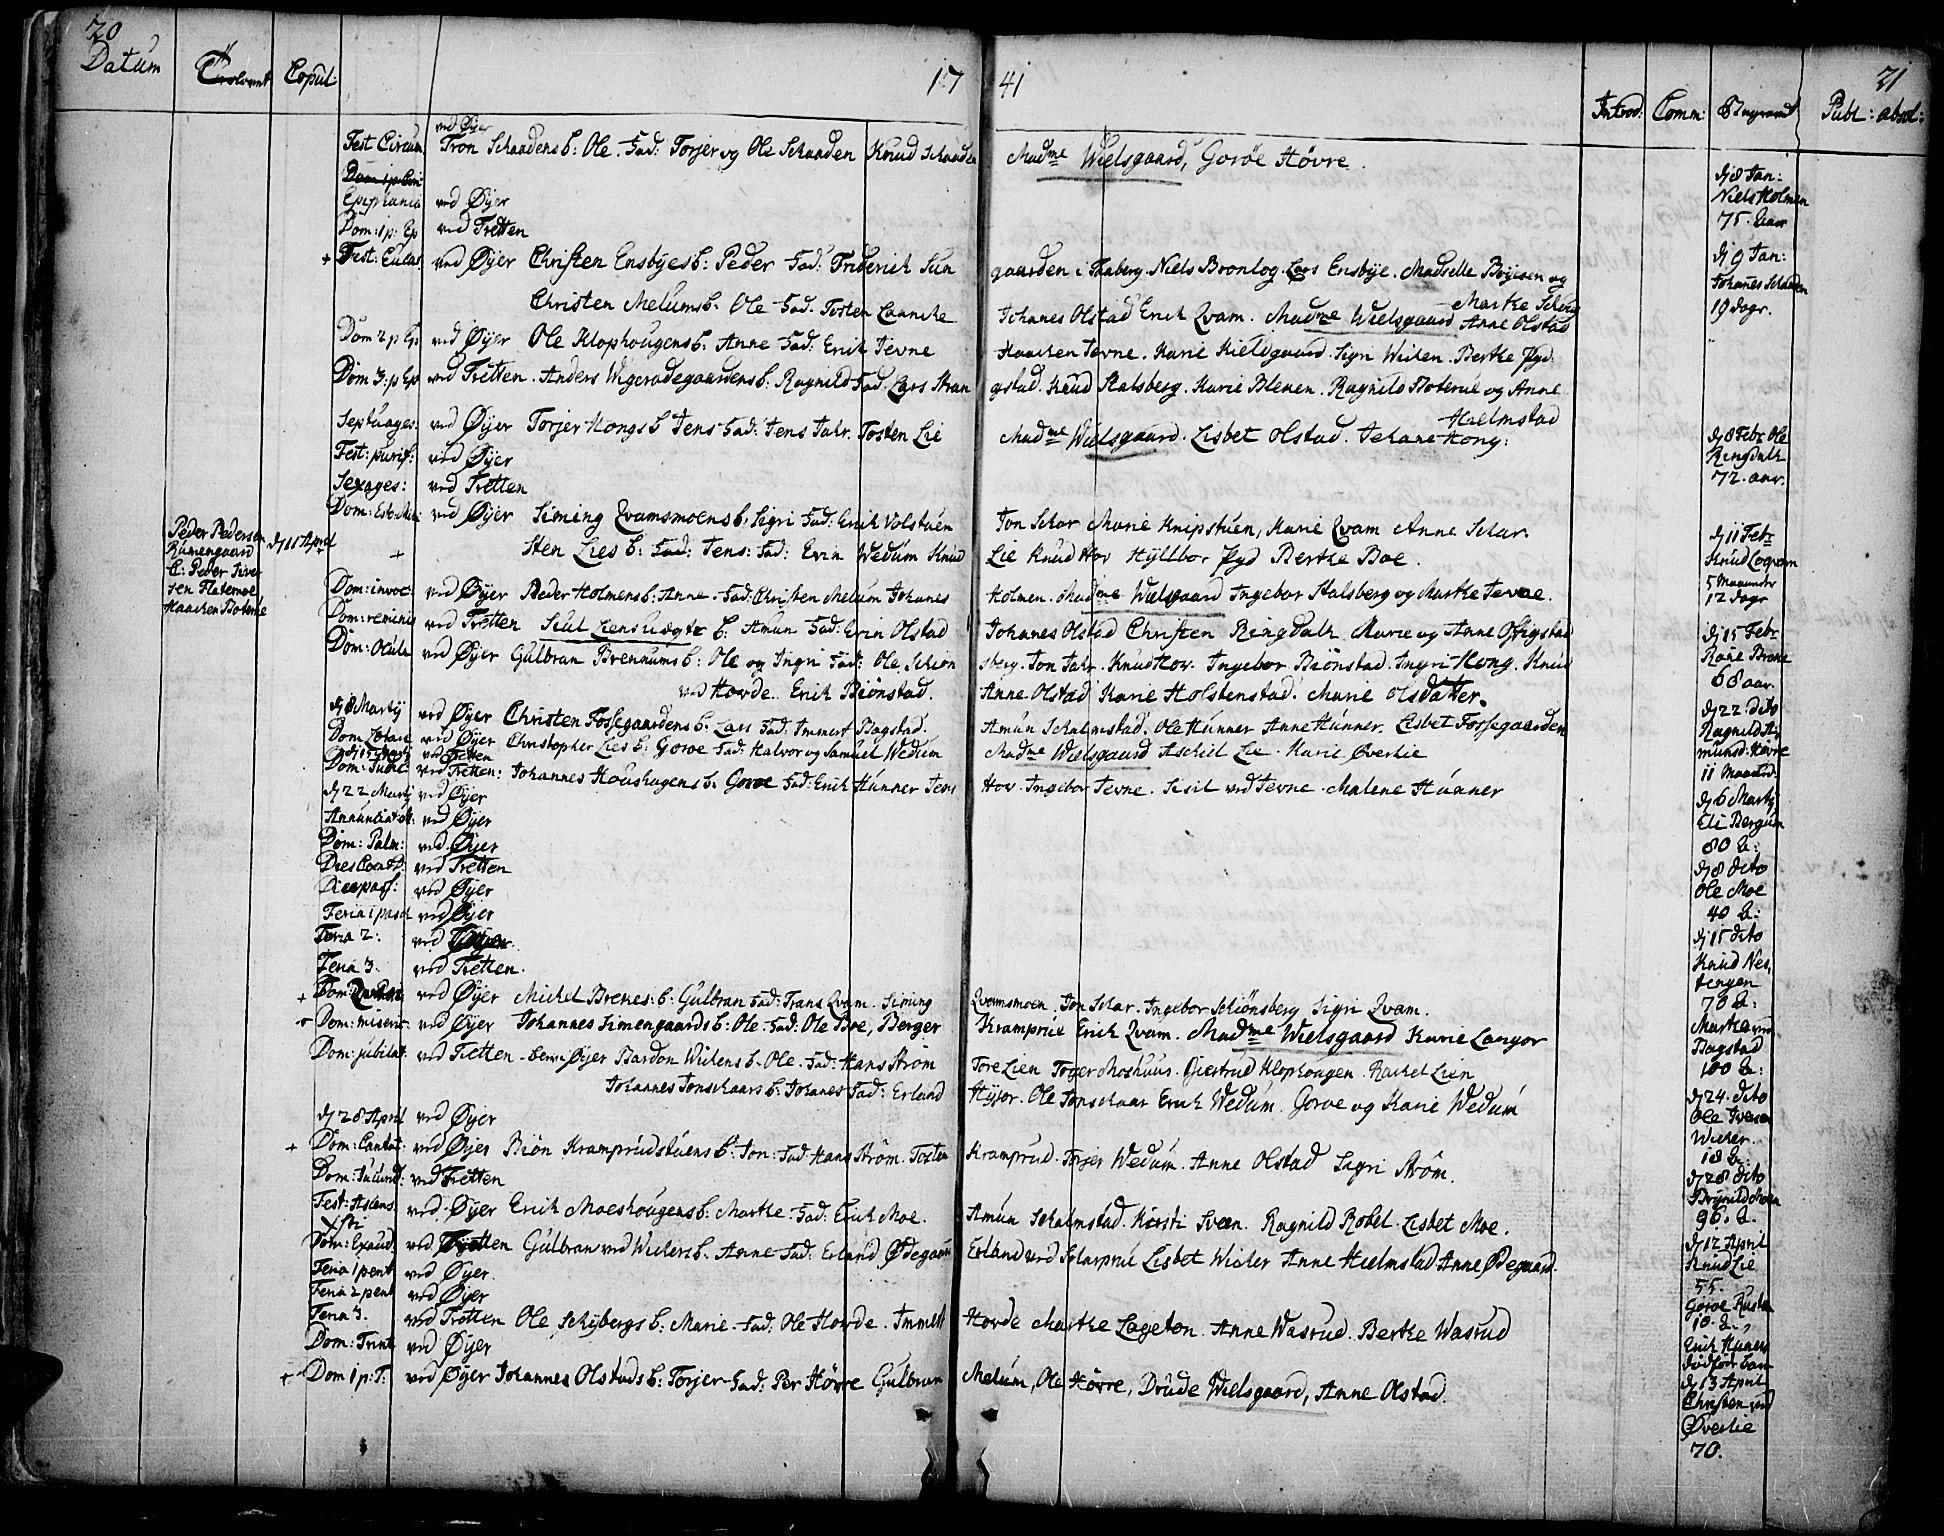 SAH, Øyer prestekontor, Ministerialbok nr. 2, 1733-1784, s. 20-21